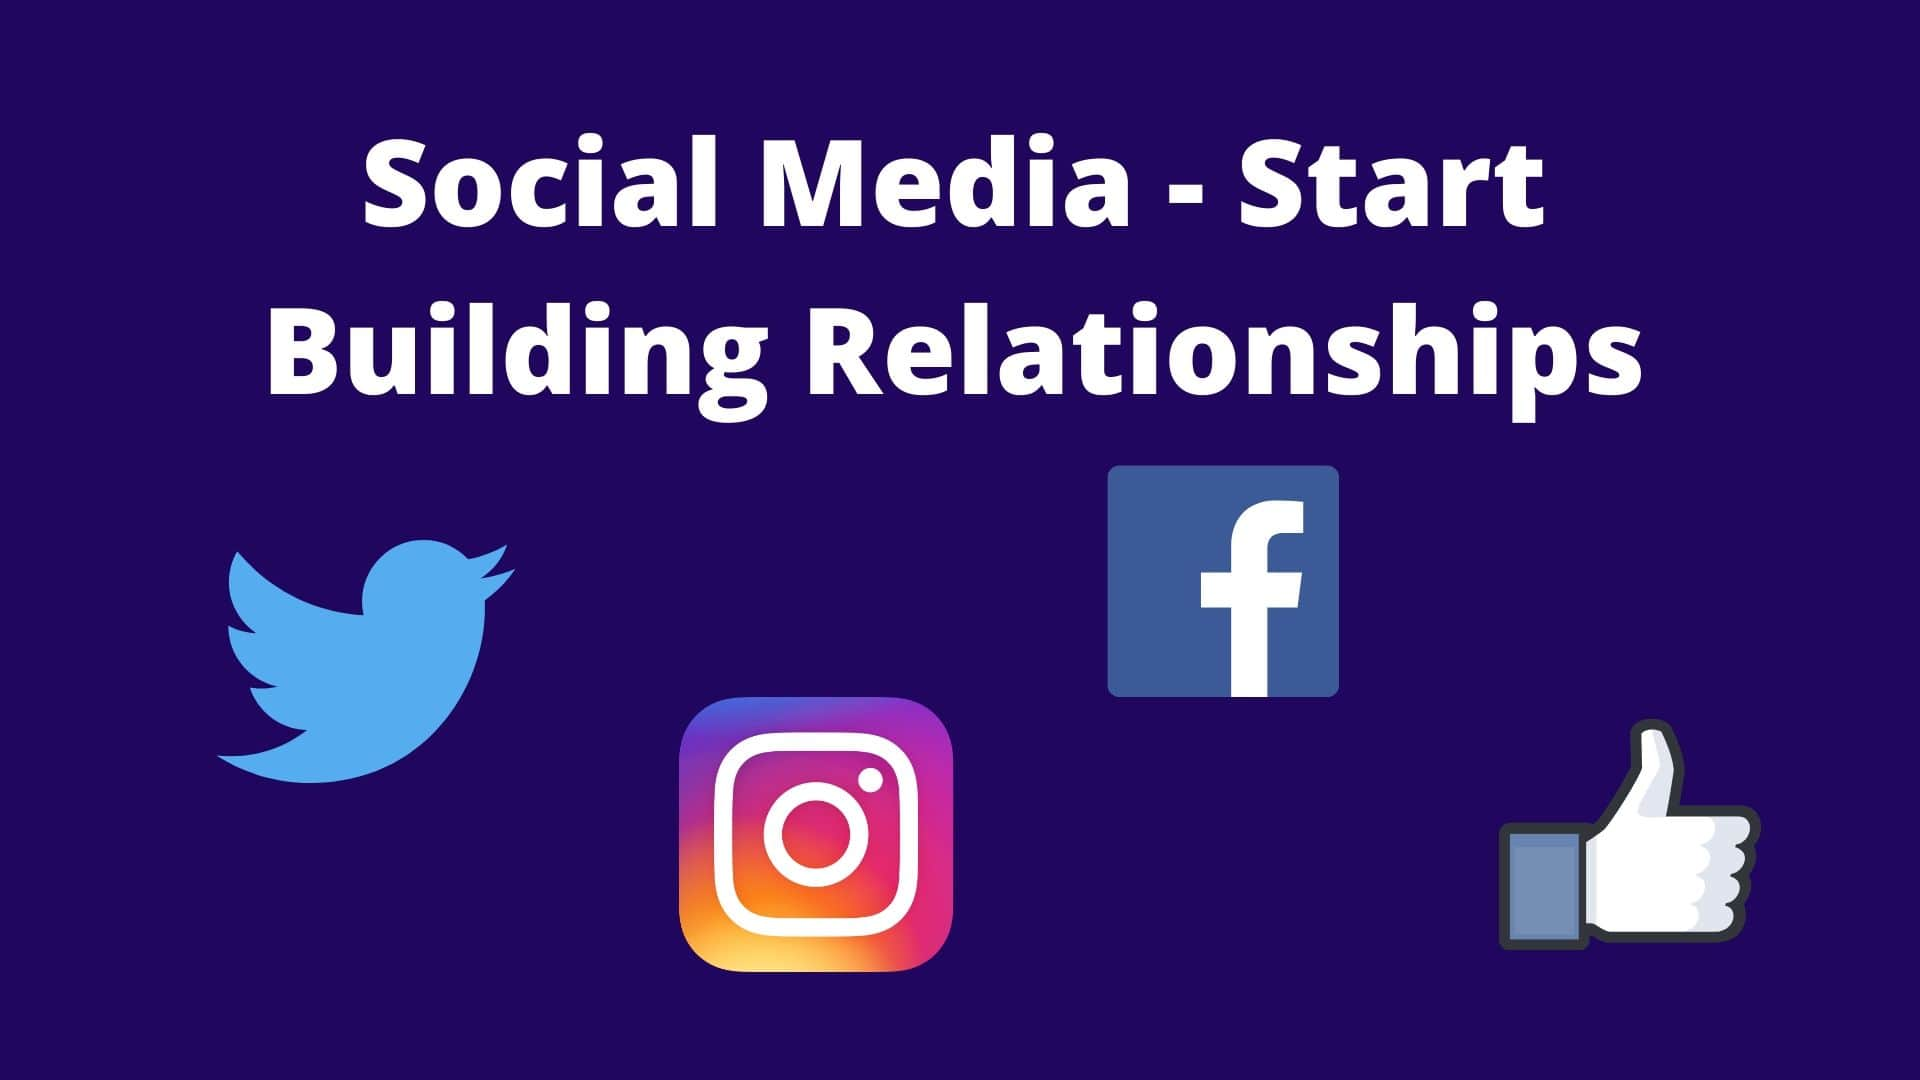 Social Media - Freelance Writing